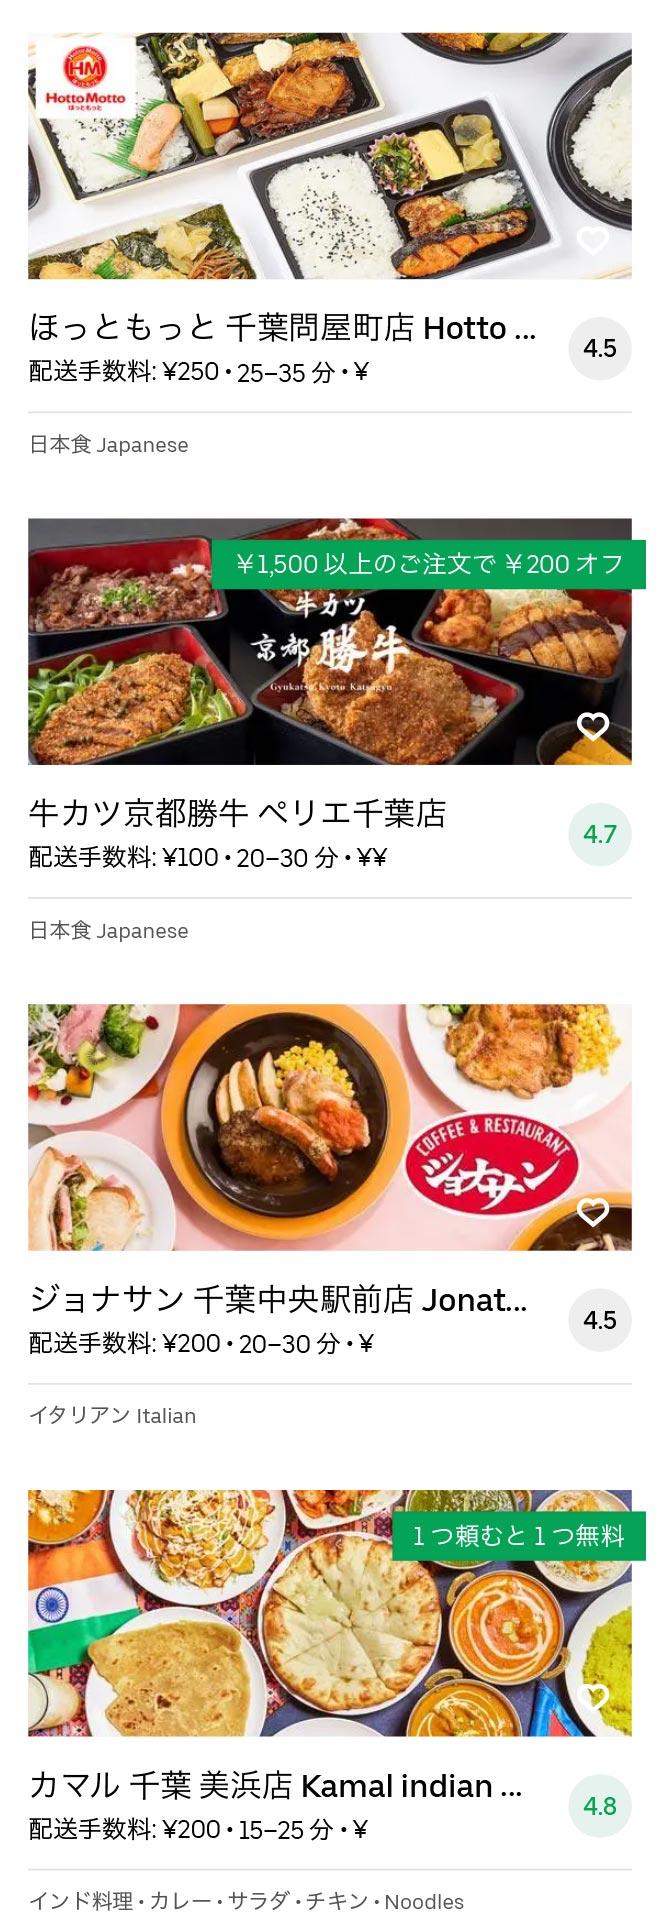 Chiba menu 2010 11